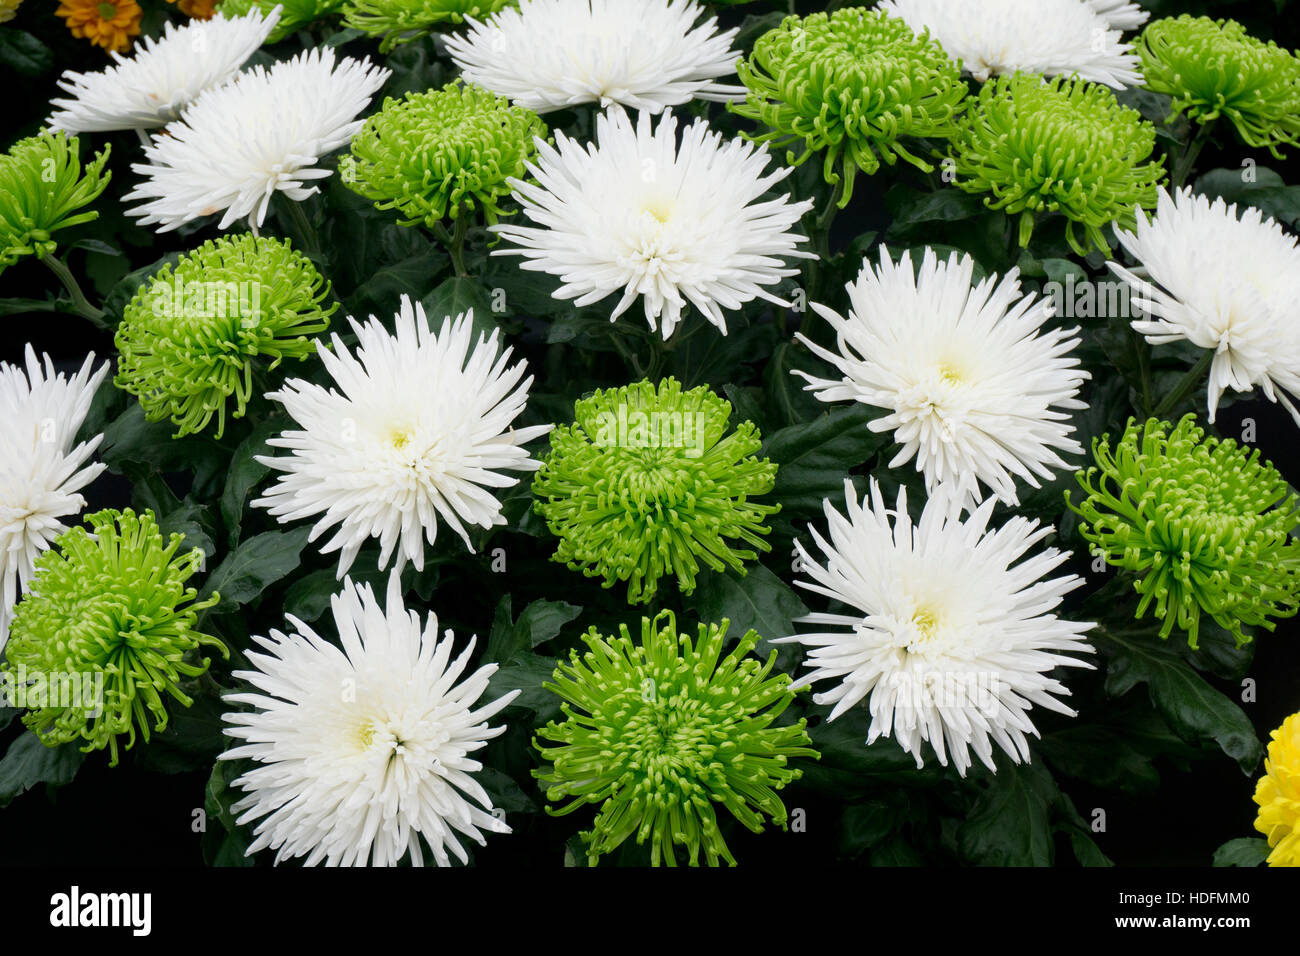 Chrysanthemum flowers green white mums chrysanths stock photo chrysanthemum flowers green white mums chrysanths mightylinksfo